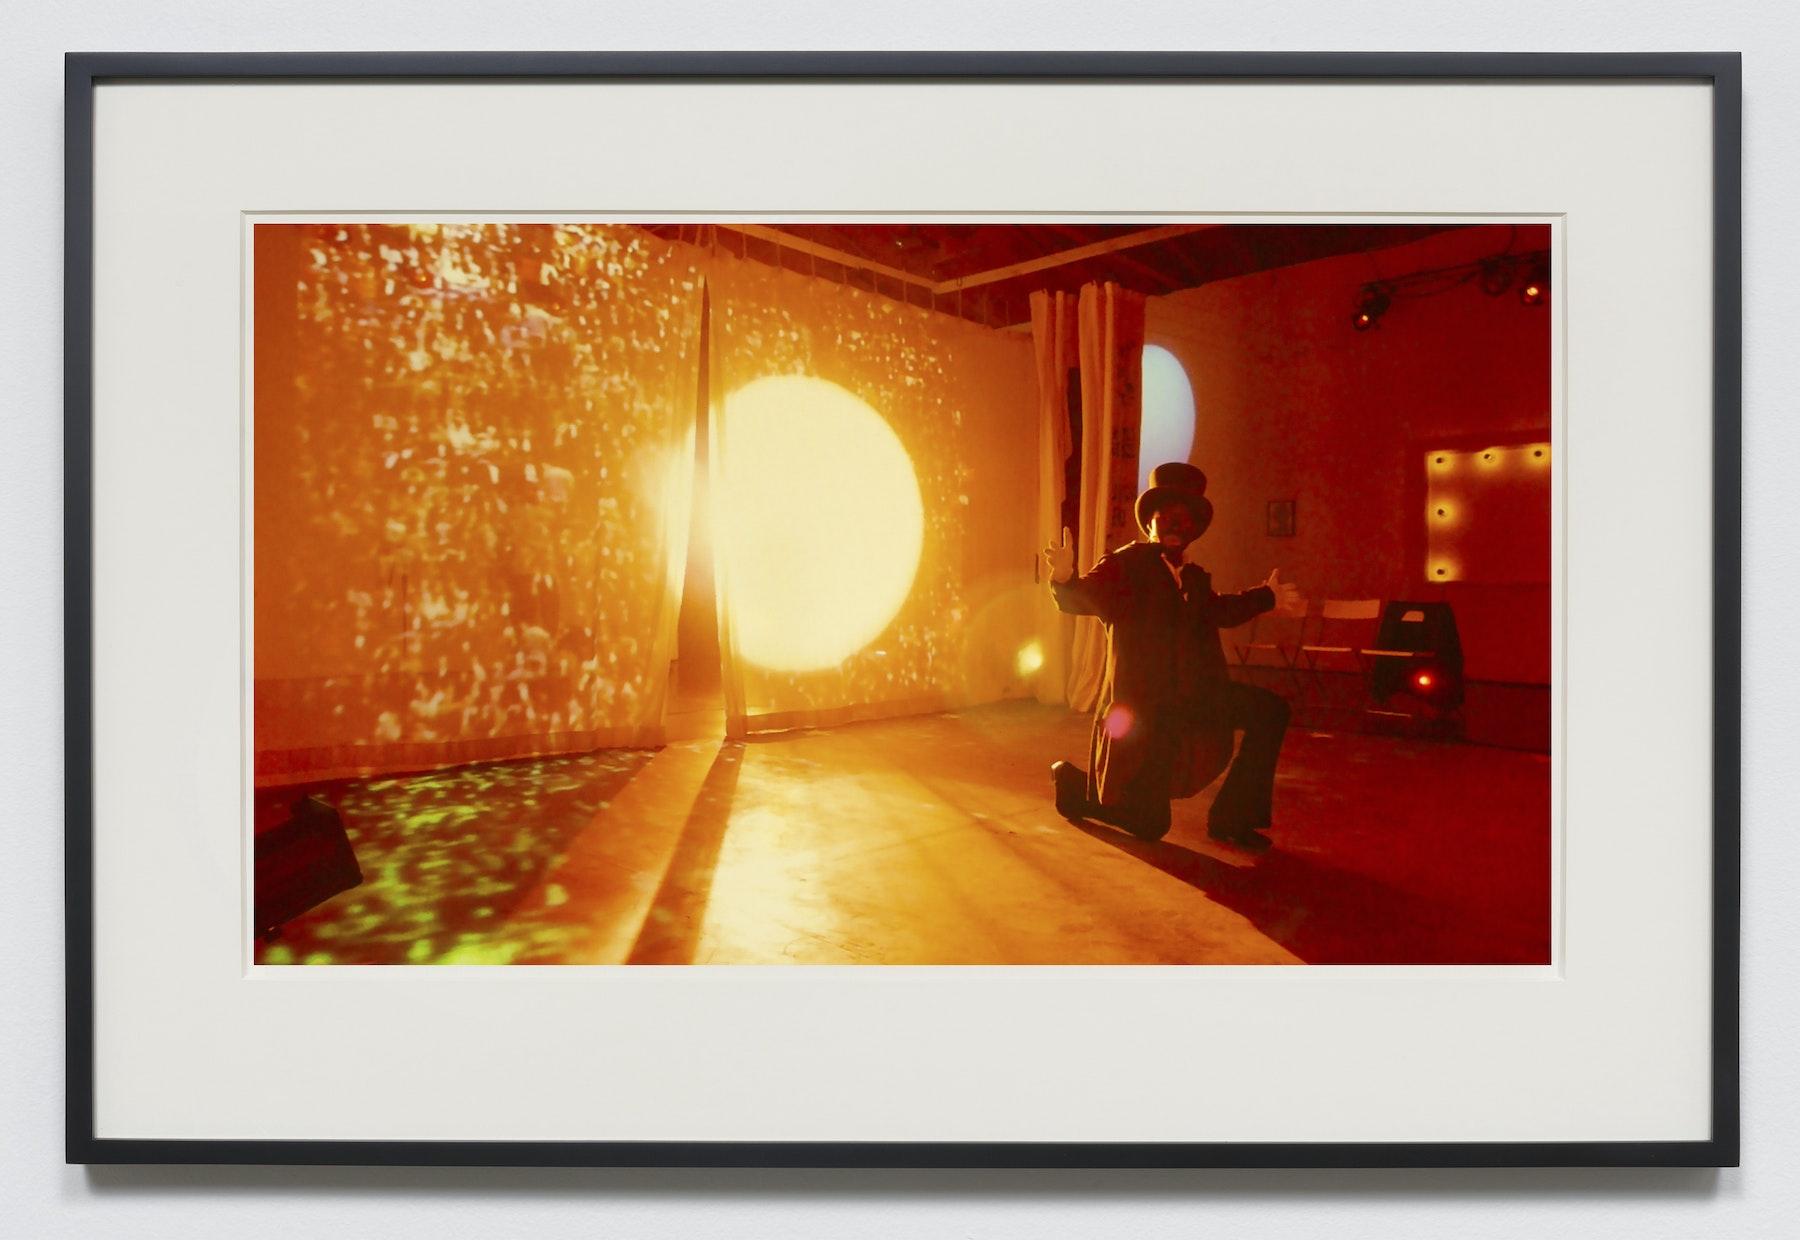 "Edgar Arceneaux ""Sunset,"" 2015-2020 Photographic print 20 x 36"" [HxW] (50.8 x 91.44 cm) unframed, 23.5 x 39.5 x 2"" [HxWxD] (59.69 x 100.33 x 5.08 cm) framed Edition 1 of 5, 2 AP Inventory #ARC627.01 Courtesy of the artist and Vielmetter Los Angeles"